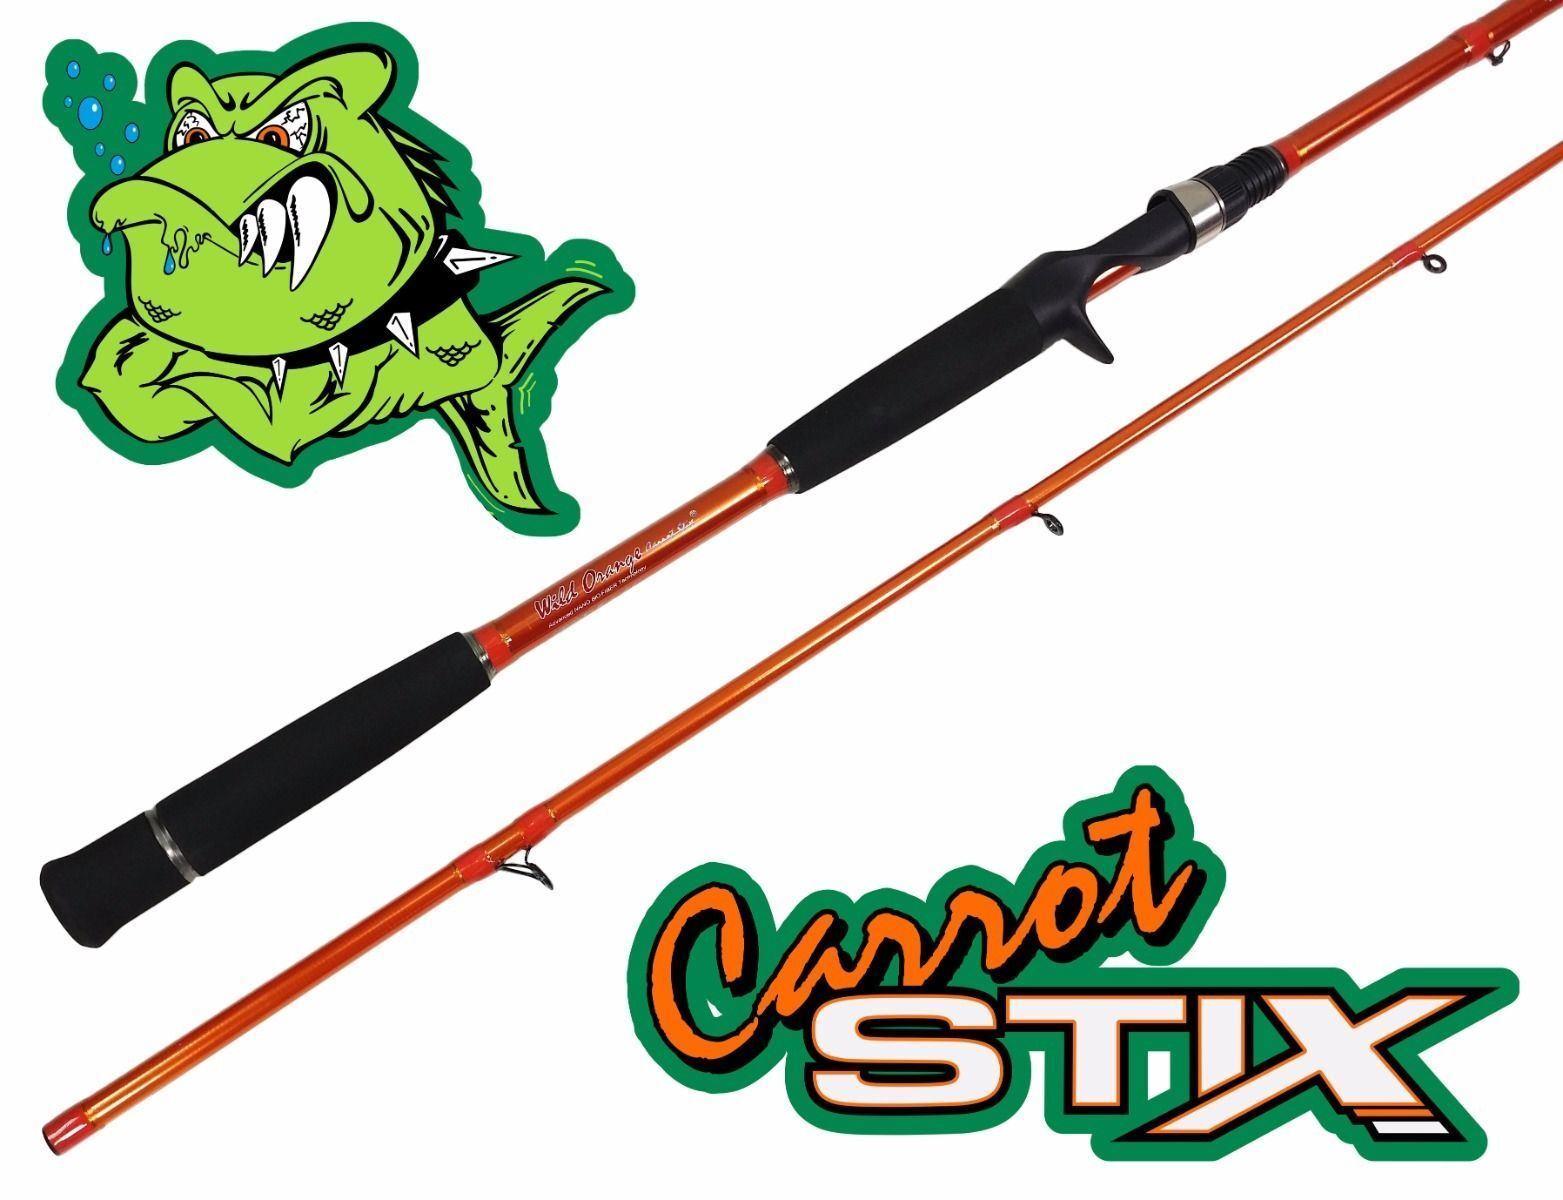 Carred Stix CASTING 9' MEDIUM HEAVY WILD orange Salmon Steelhead Fishing Rod